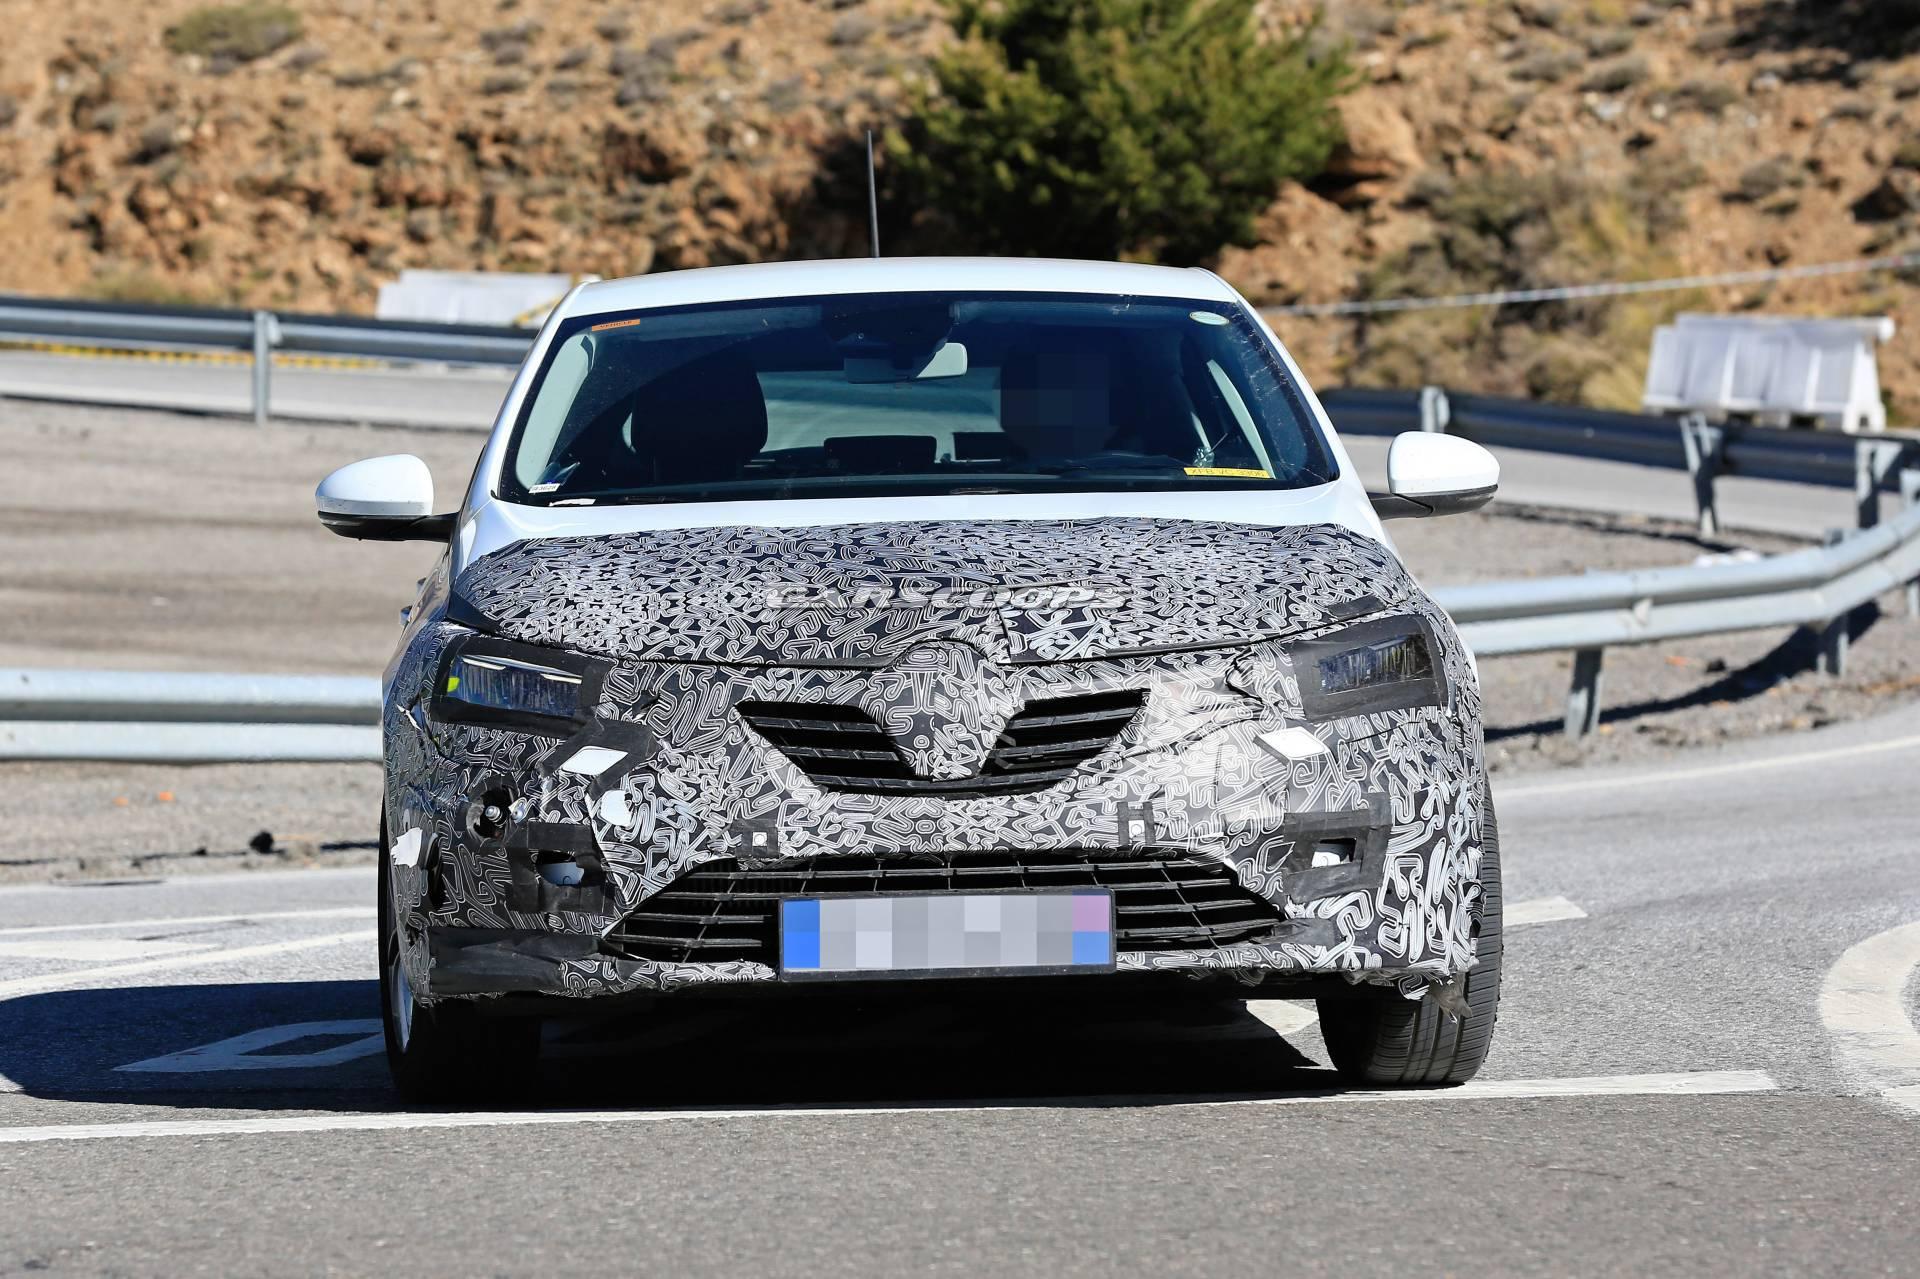 Photo of Renault Megane, Frankfurt'a makyajlanarak geliyor!